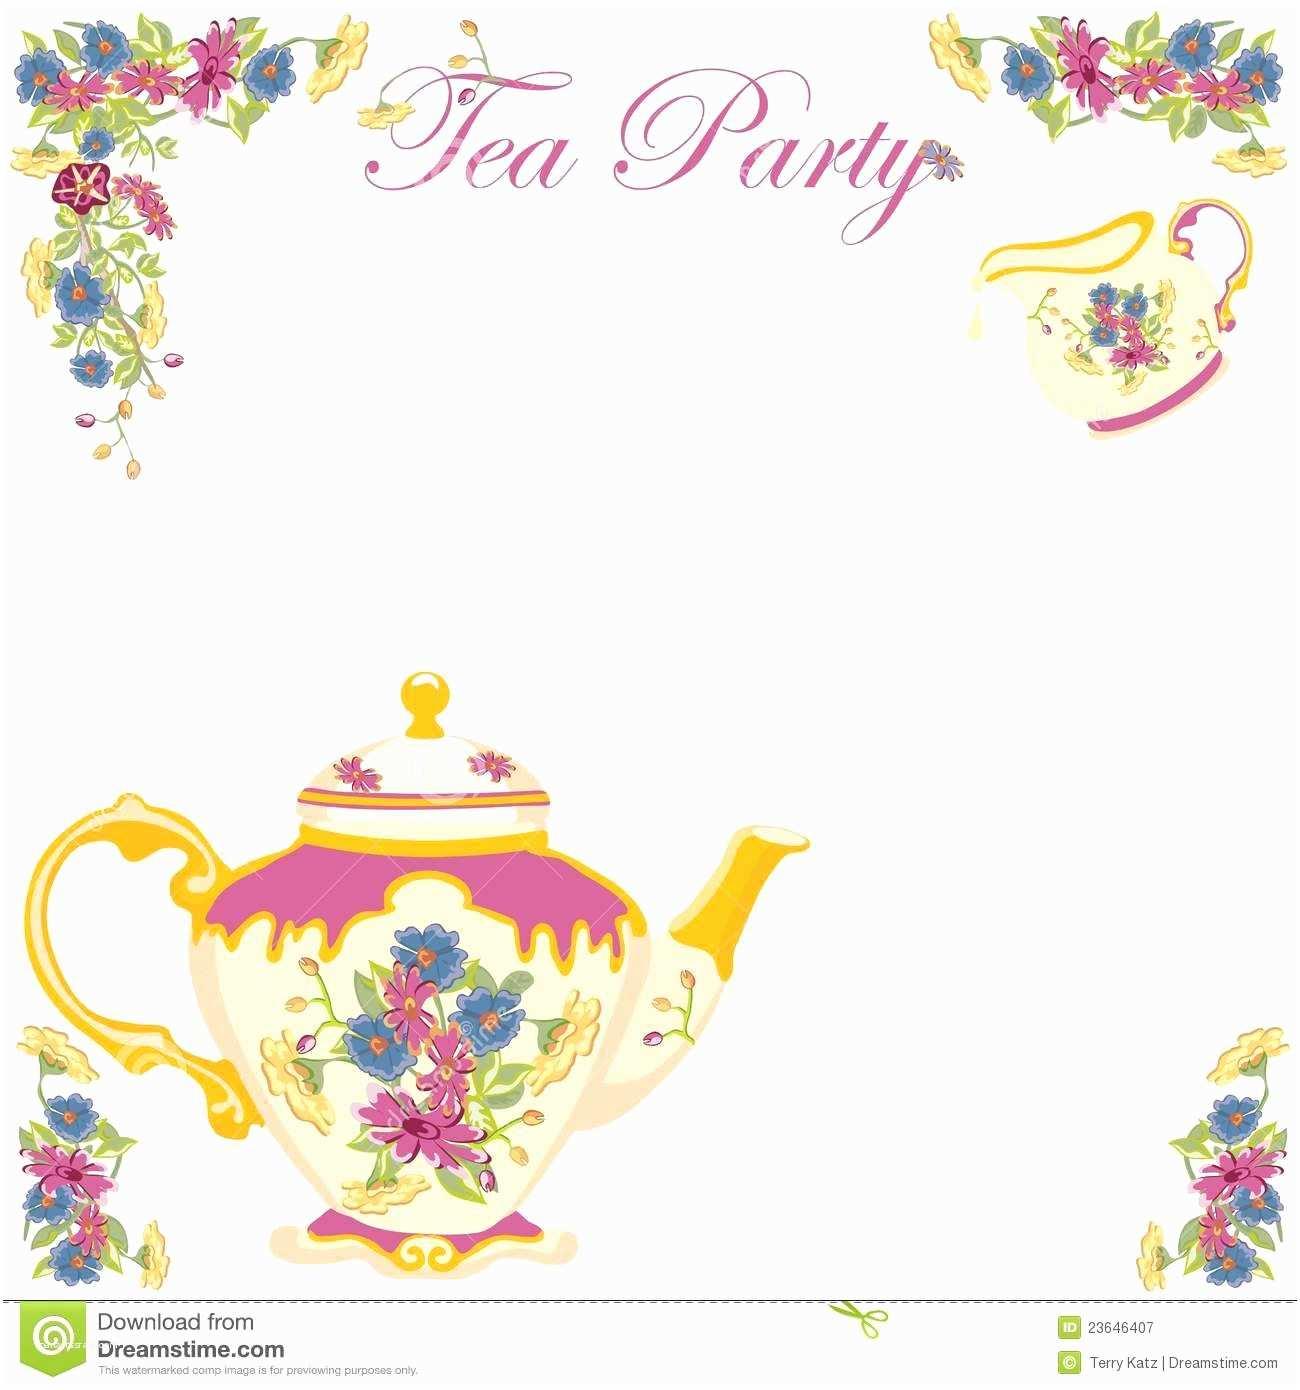 Tea Party Invitation Template Free Tea Party